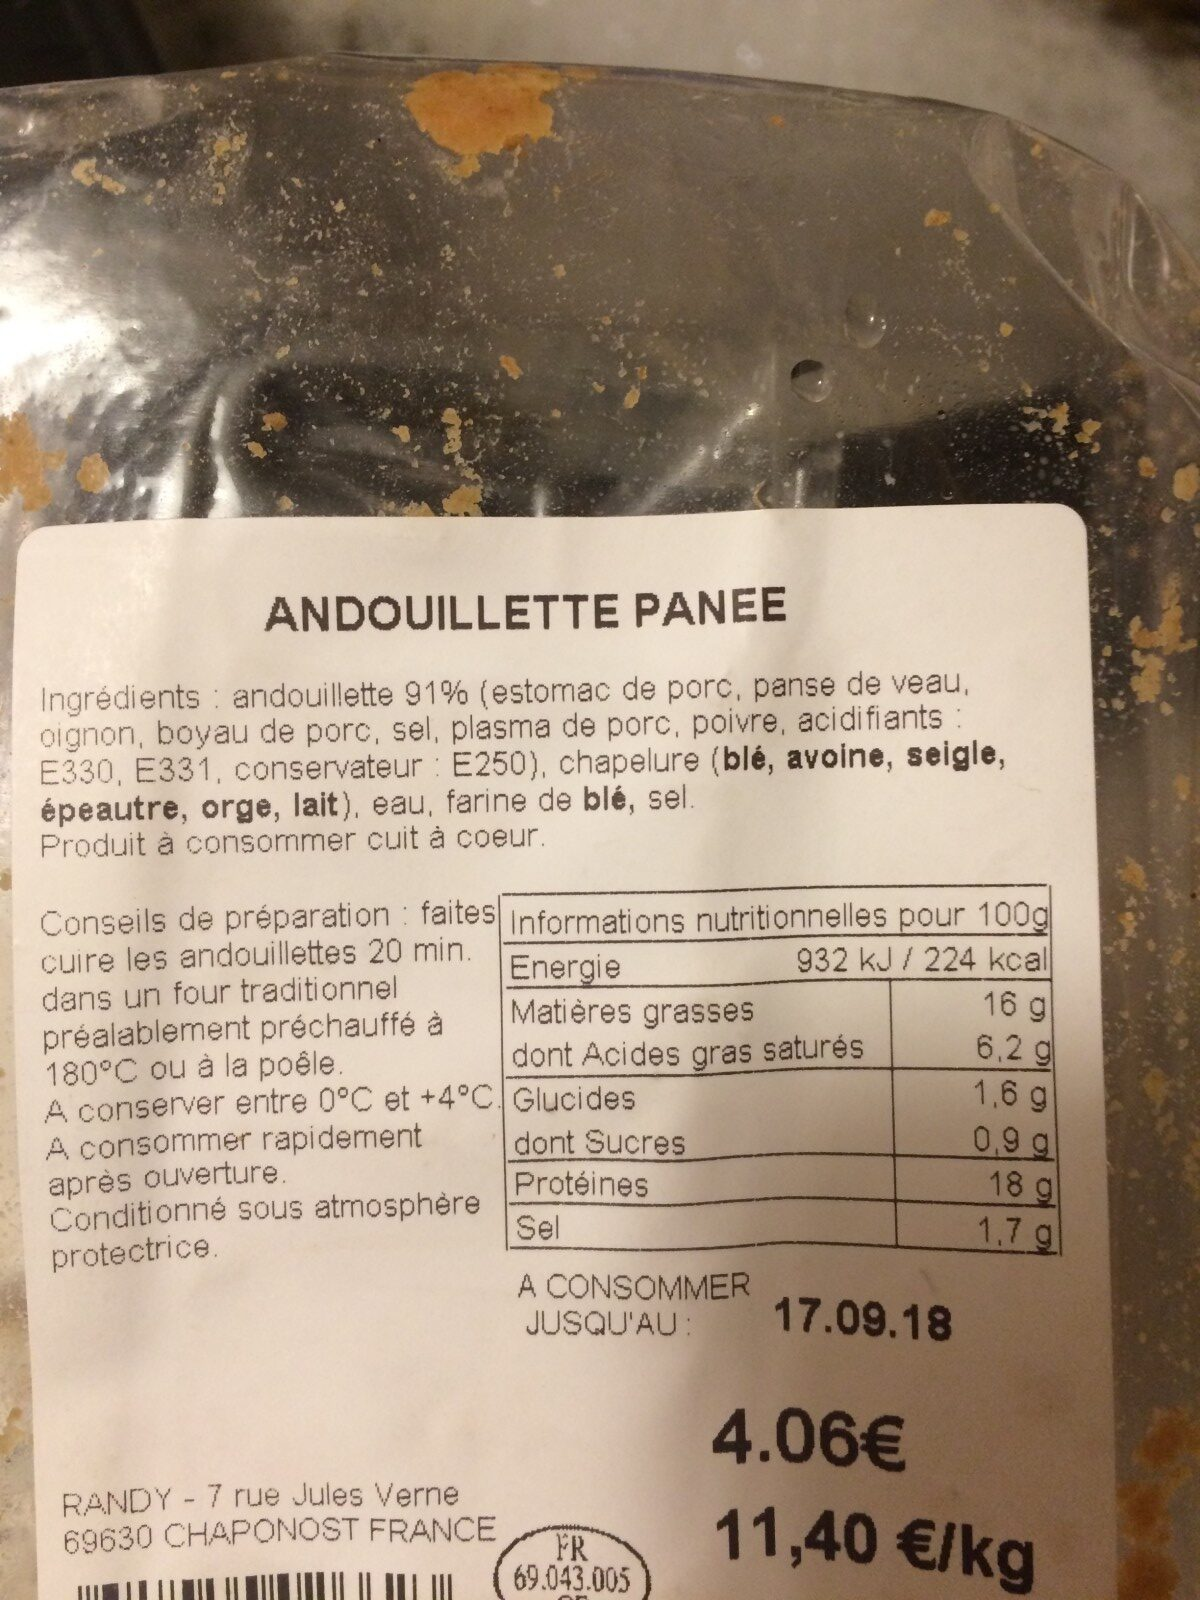 Andouillette panee - Ingrédients - fr